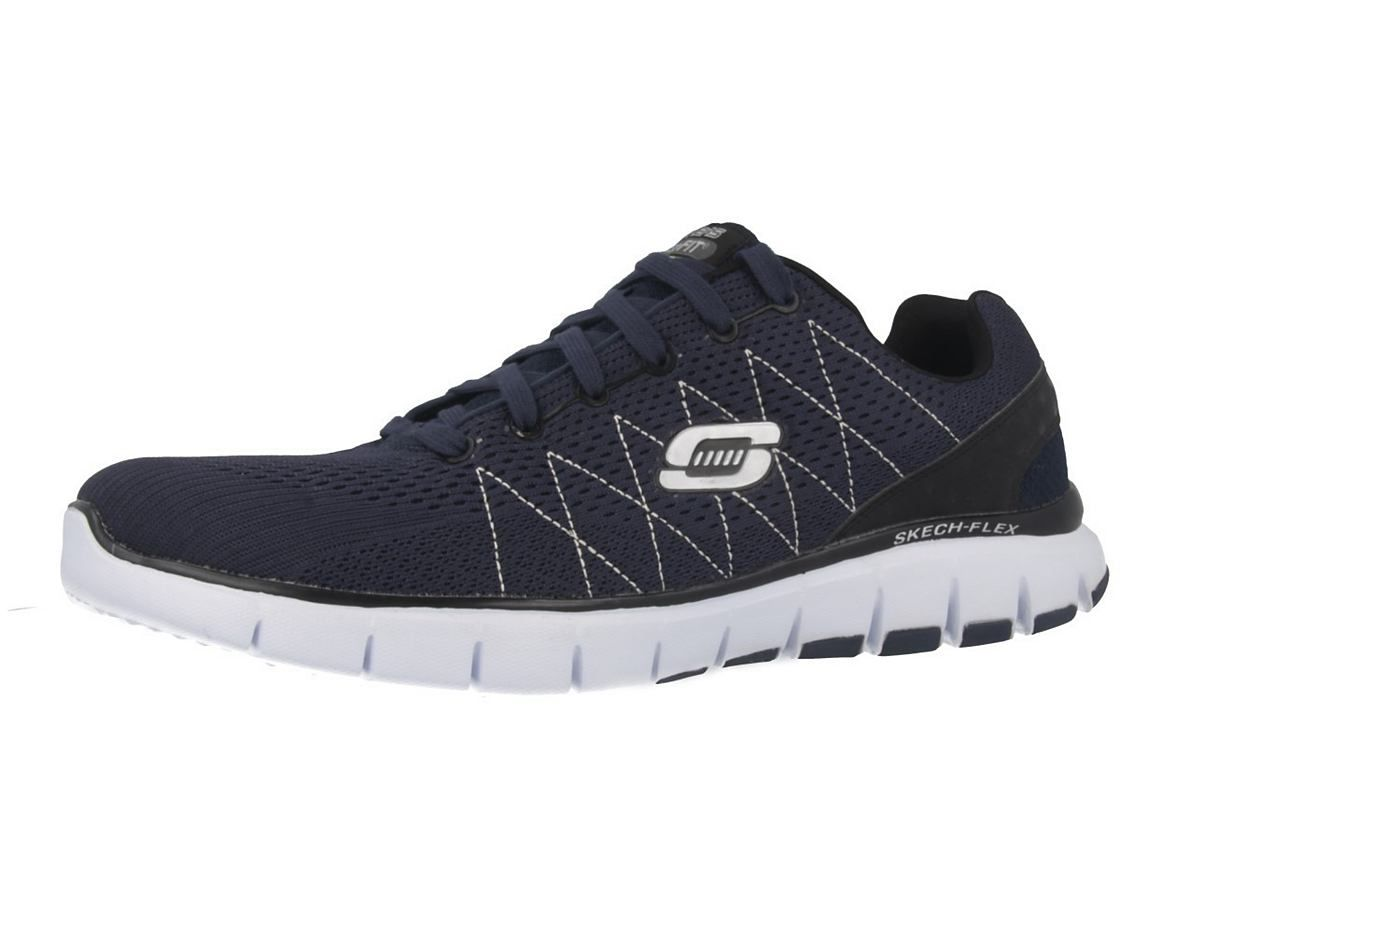 Skechers Sneaker | Produktkatalog | Schuhe, Zielgruppe und